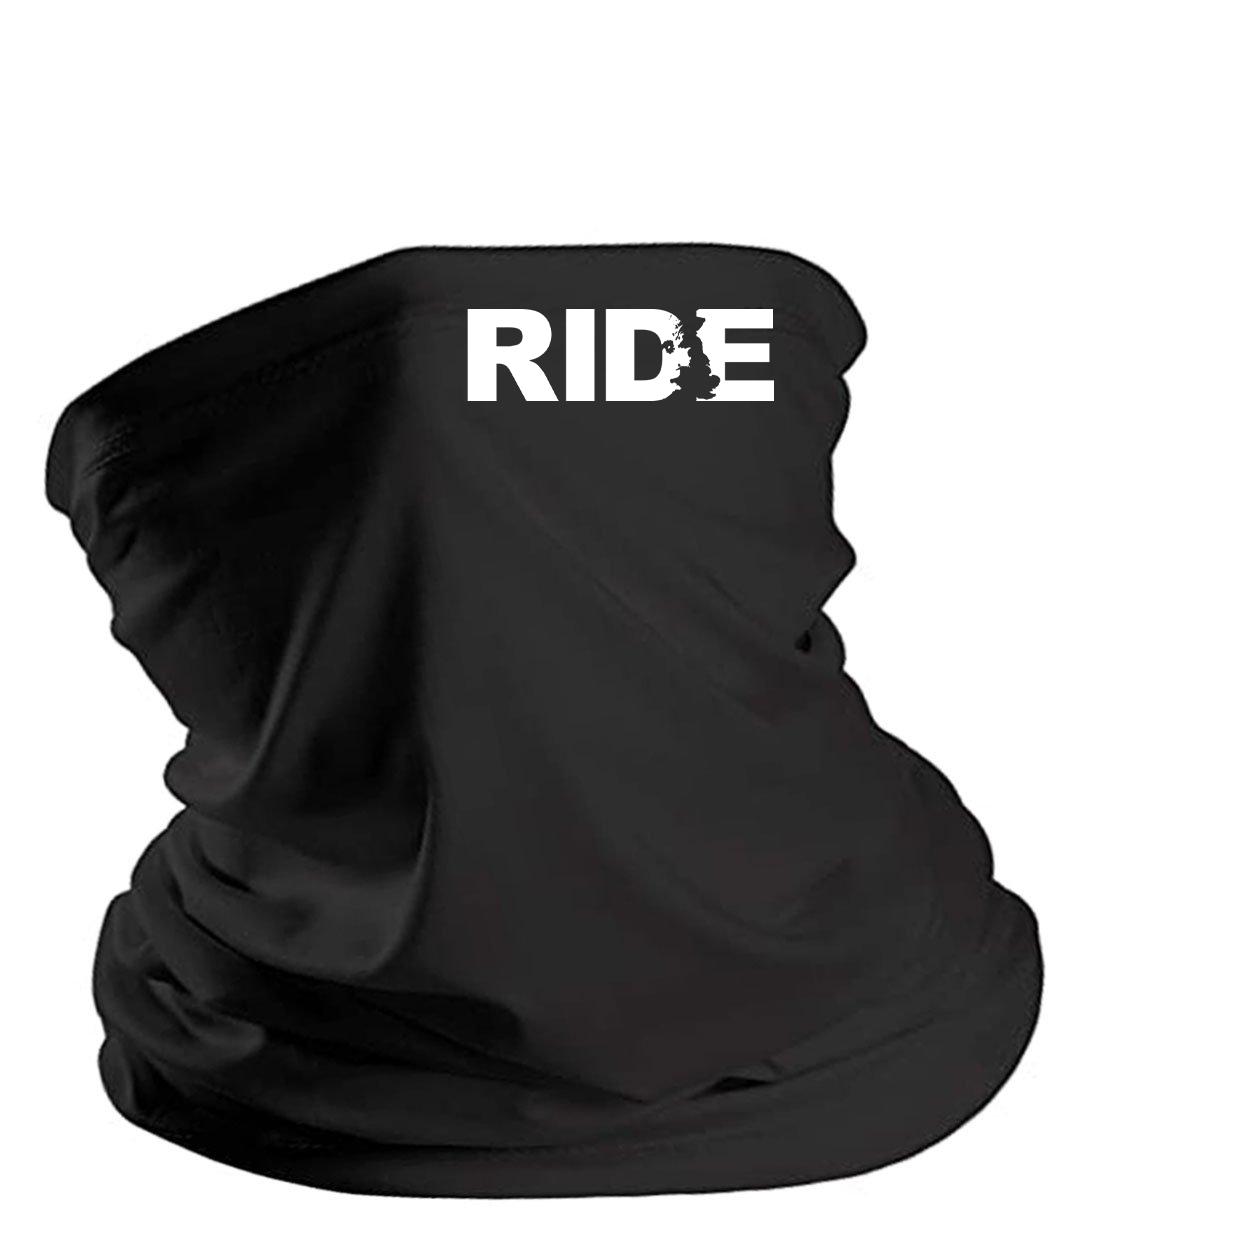 Ride United Kingdom Night Out Lightweight Neck Gaiter Face Mask Black (White Logo)